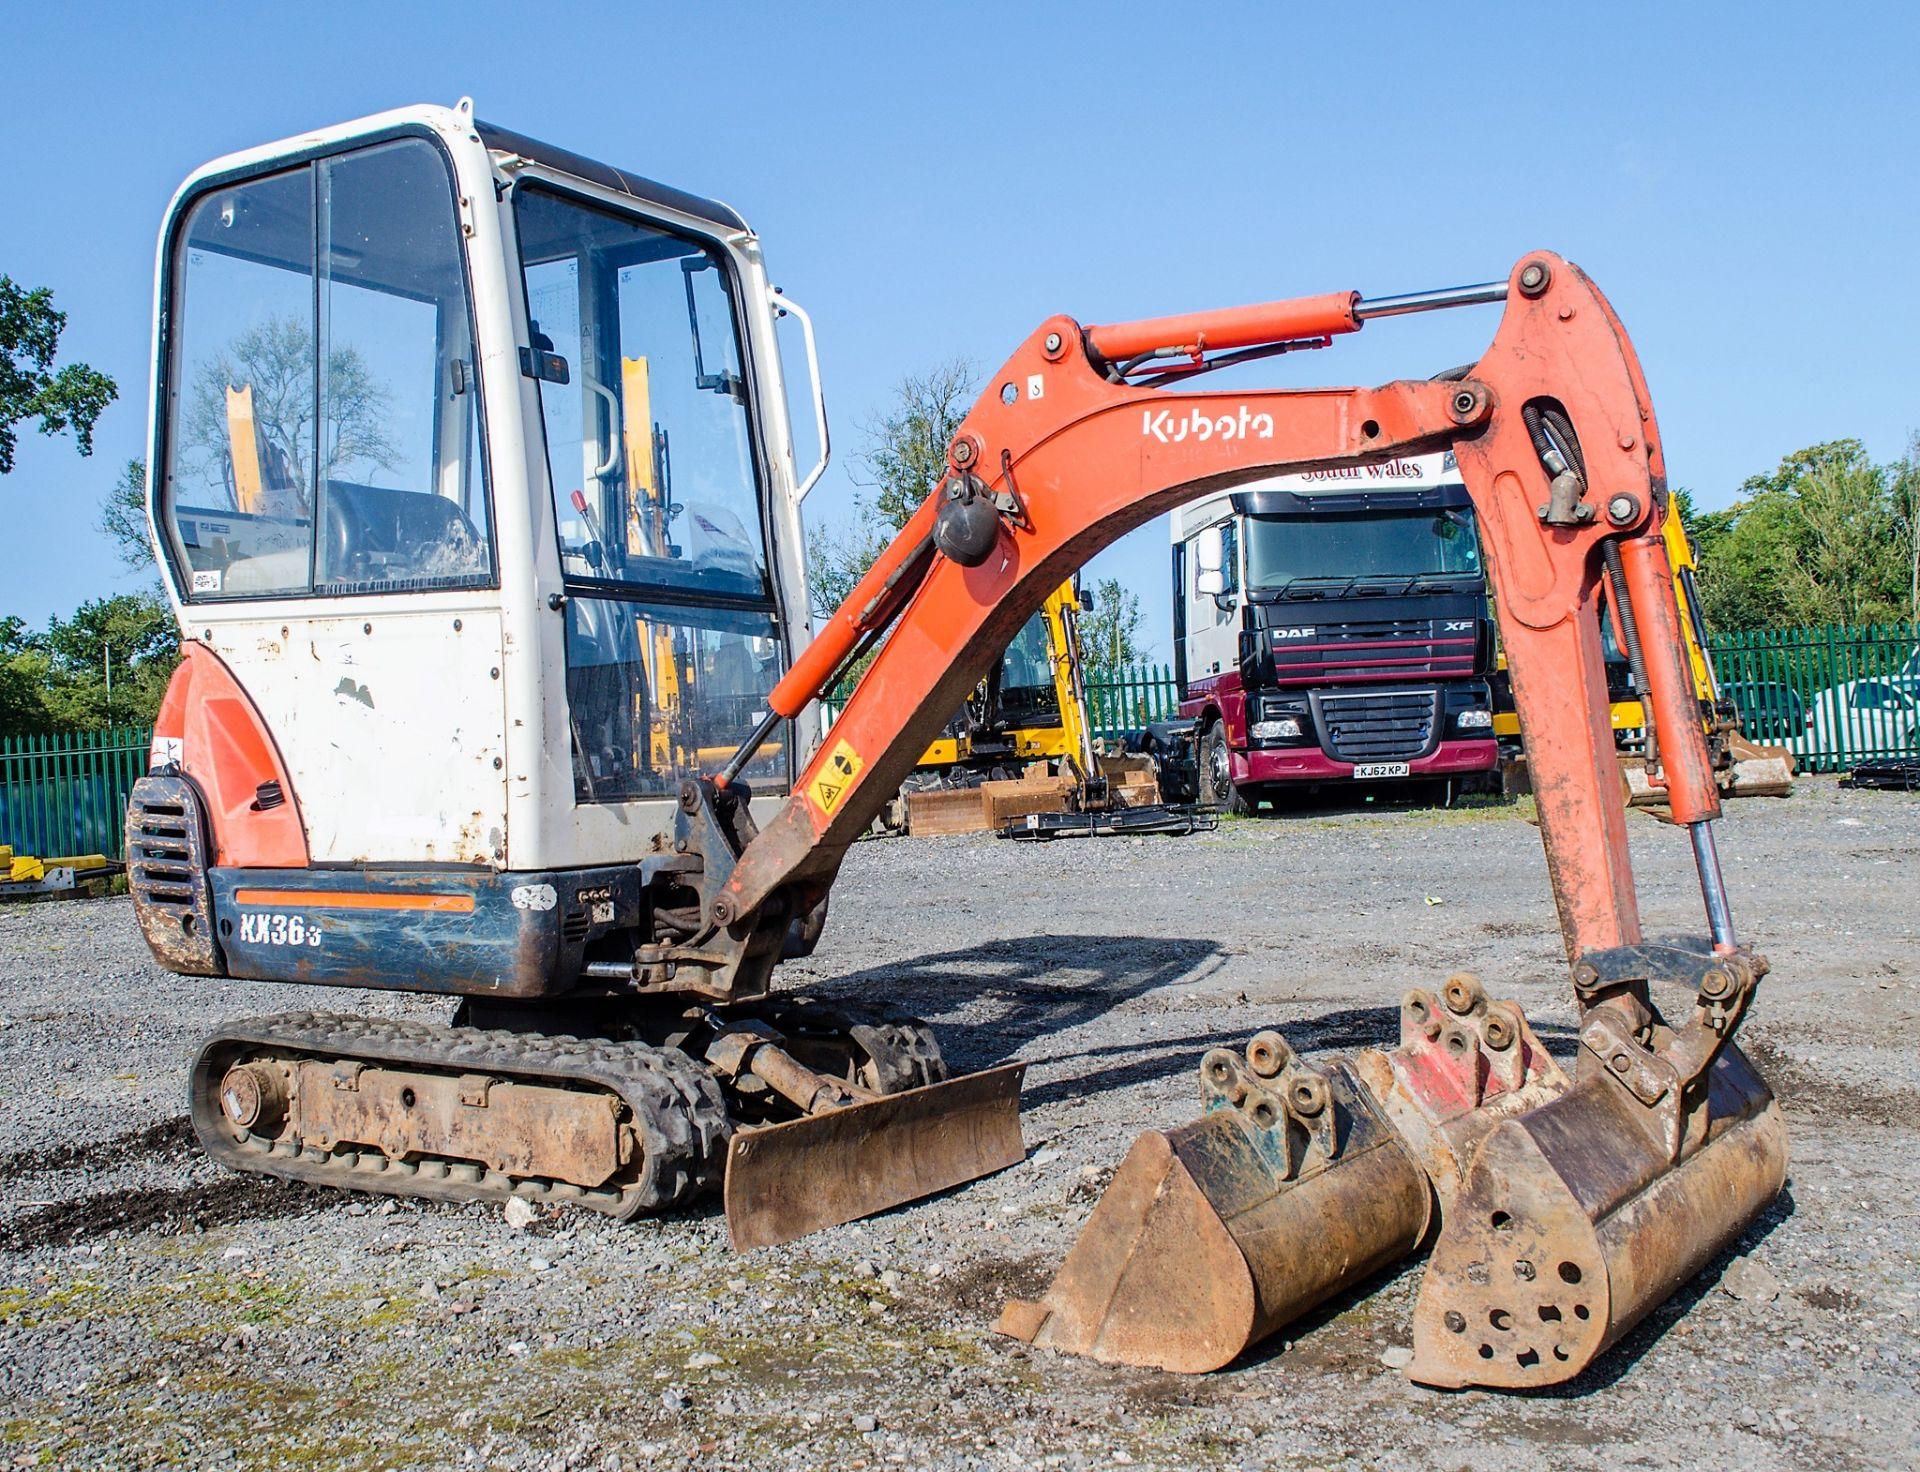 Kubota KX36-3 1.5 tonne rubber tracked mini excavator Year: 2007 S/N: Z077298 Recorded Hours: 4205 - Image 2 of 18